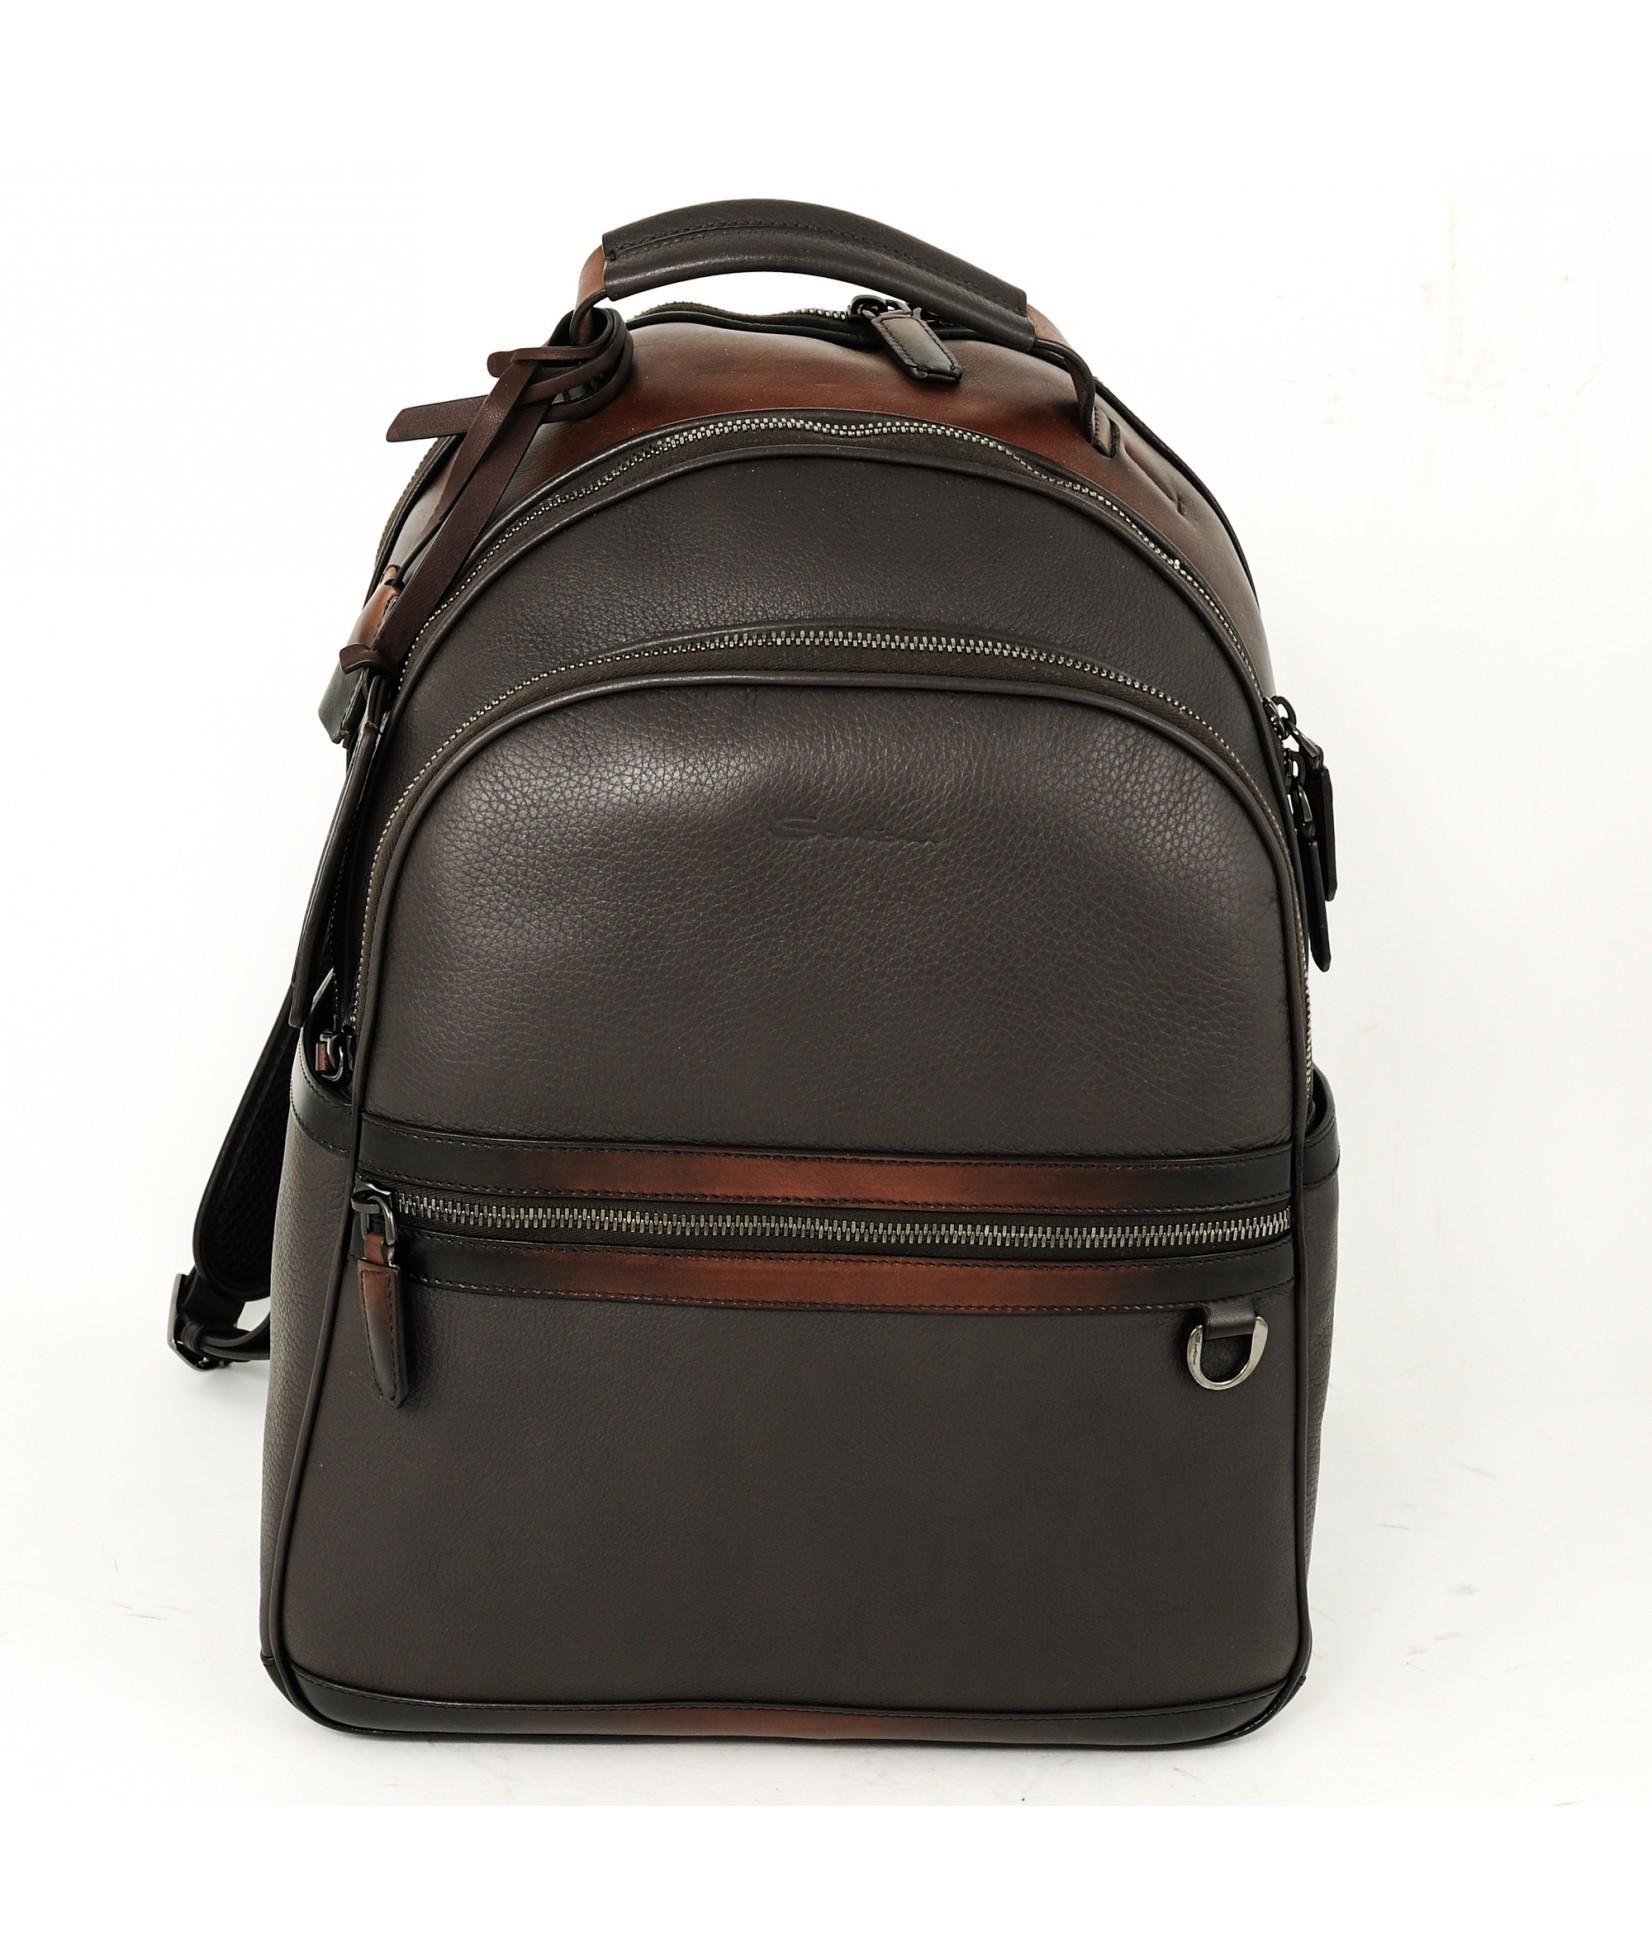 Santoni Backpack (32726)